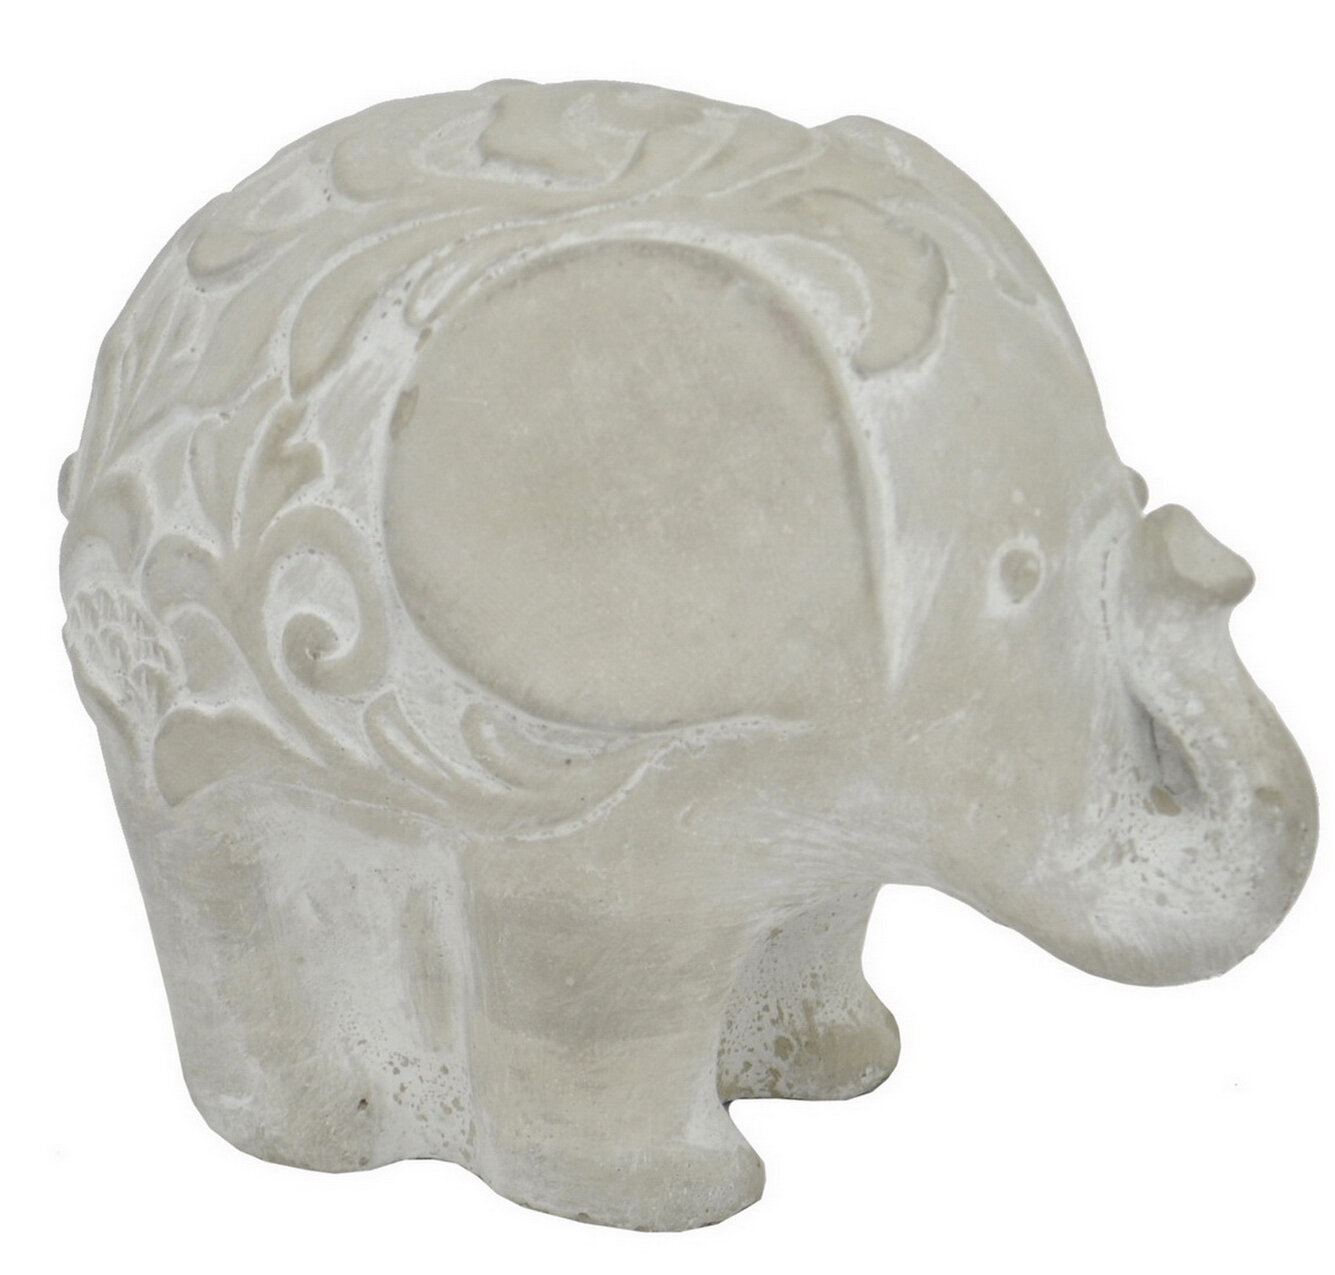 World Menagerie Schall Elephant Figurine Wayfair